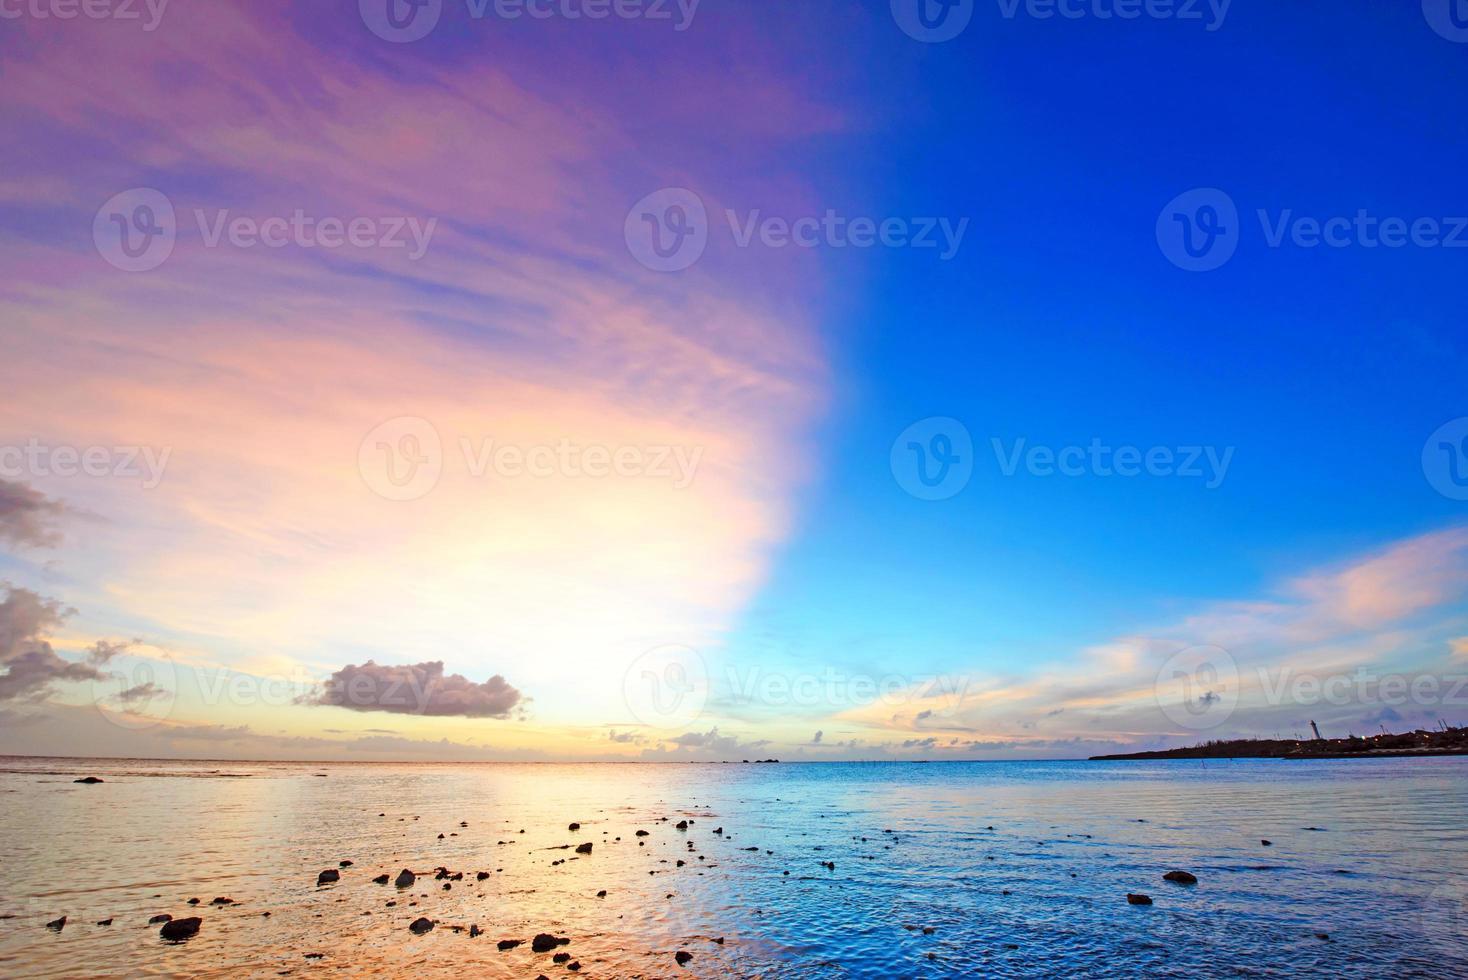 fantastisk solnedgång, okinawa, japan foto